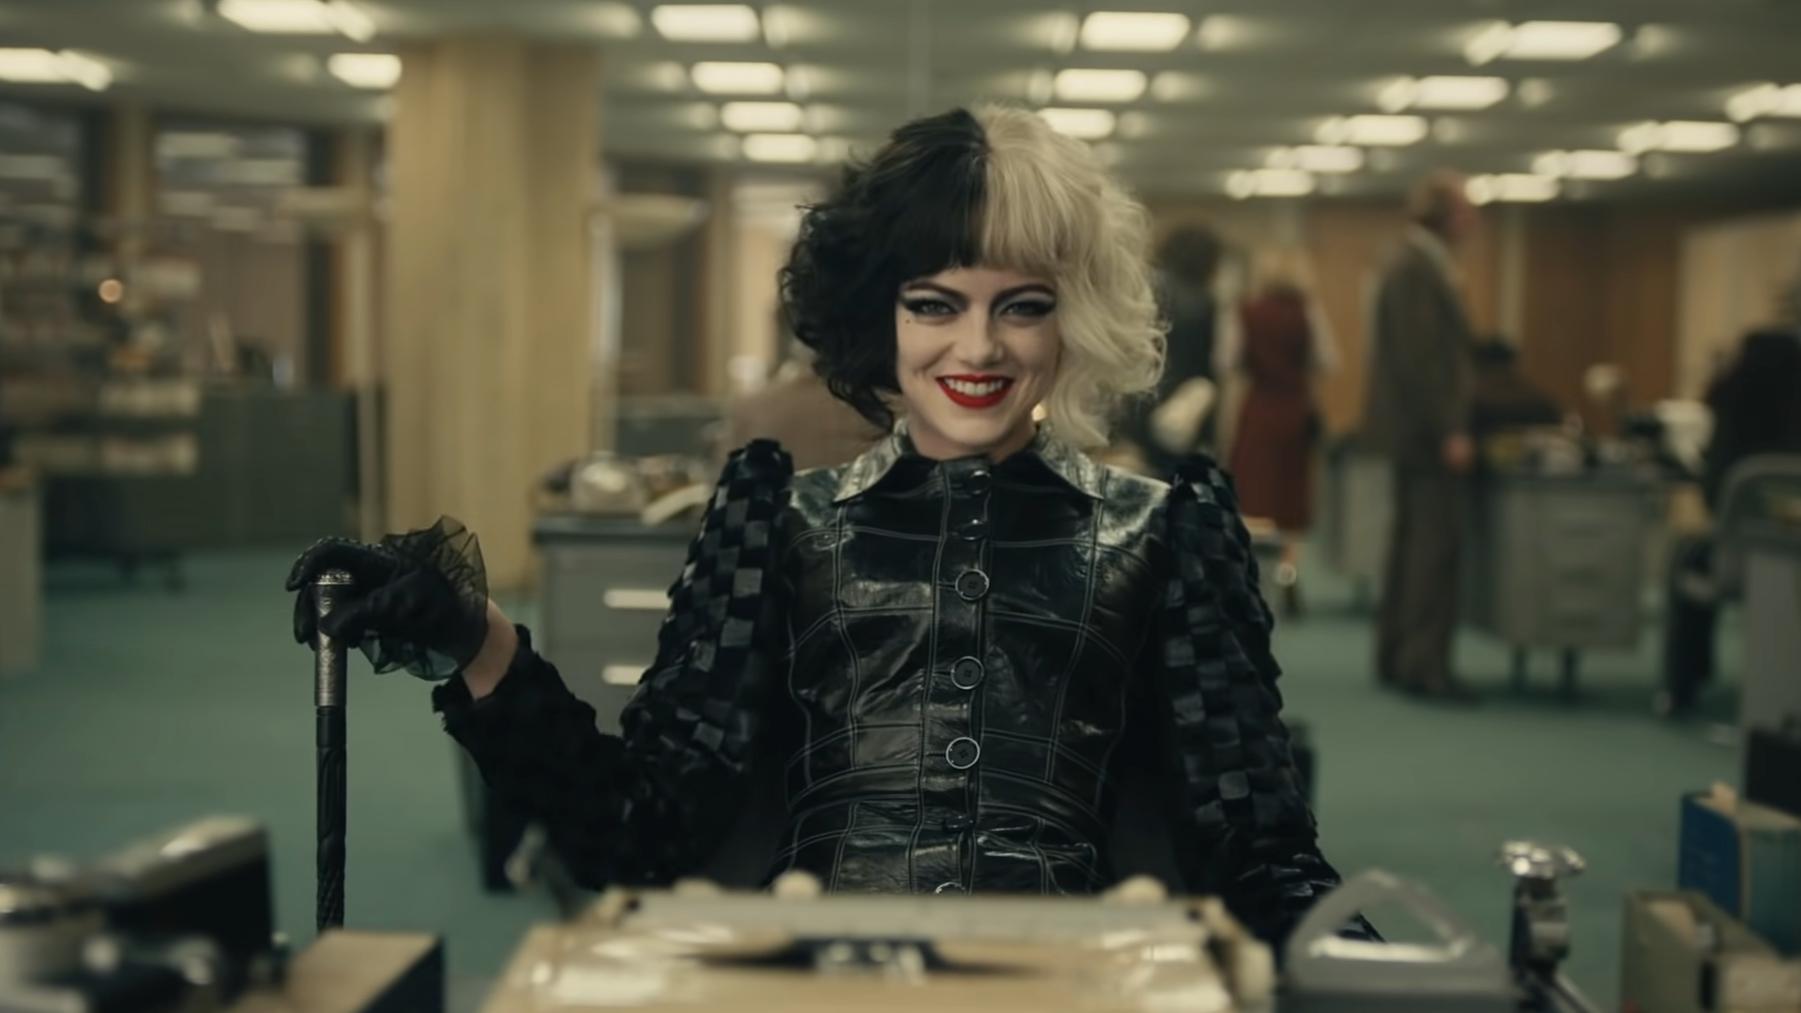 WATCH: The Second Trailer to Disney's 'Cruella,' Starring Emma Stone and Emma Thompson